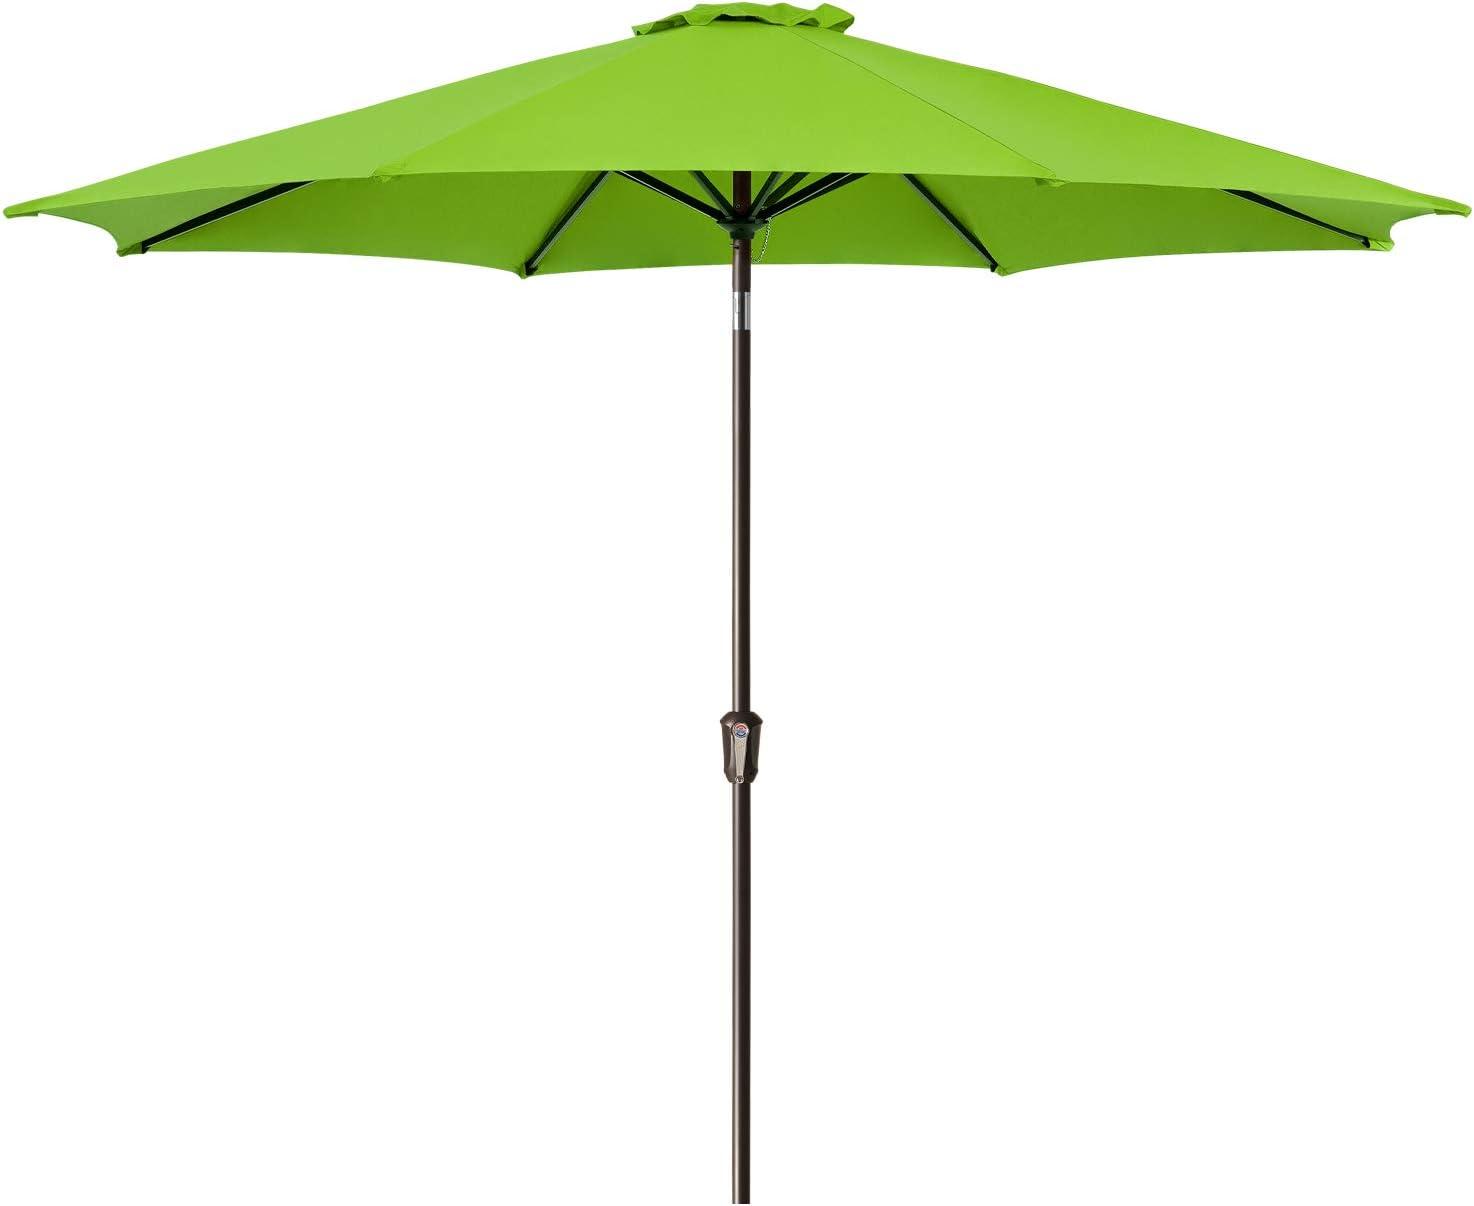 Ralawen 11 FT Patio Umbrella Outdoor Market Table Umbrellas with Push Button Tilt/Crank (11 ft,Apple Green)